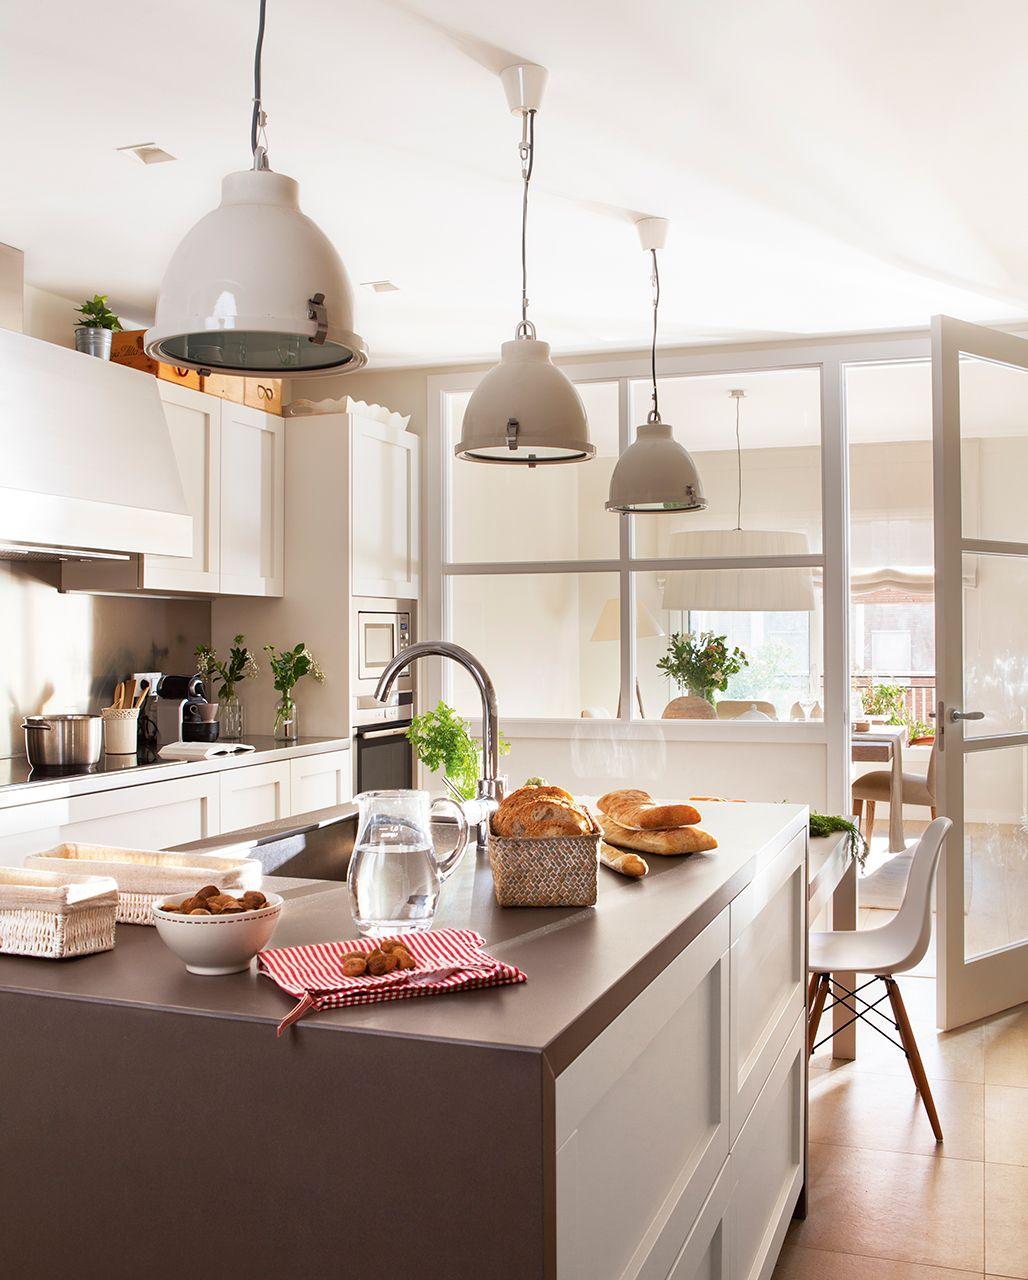 cocinas etc lmparas cocina comedor cocina cocinas modernas cocinas con isla salon cocina cocina isla despensa barcelona tranquilo